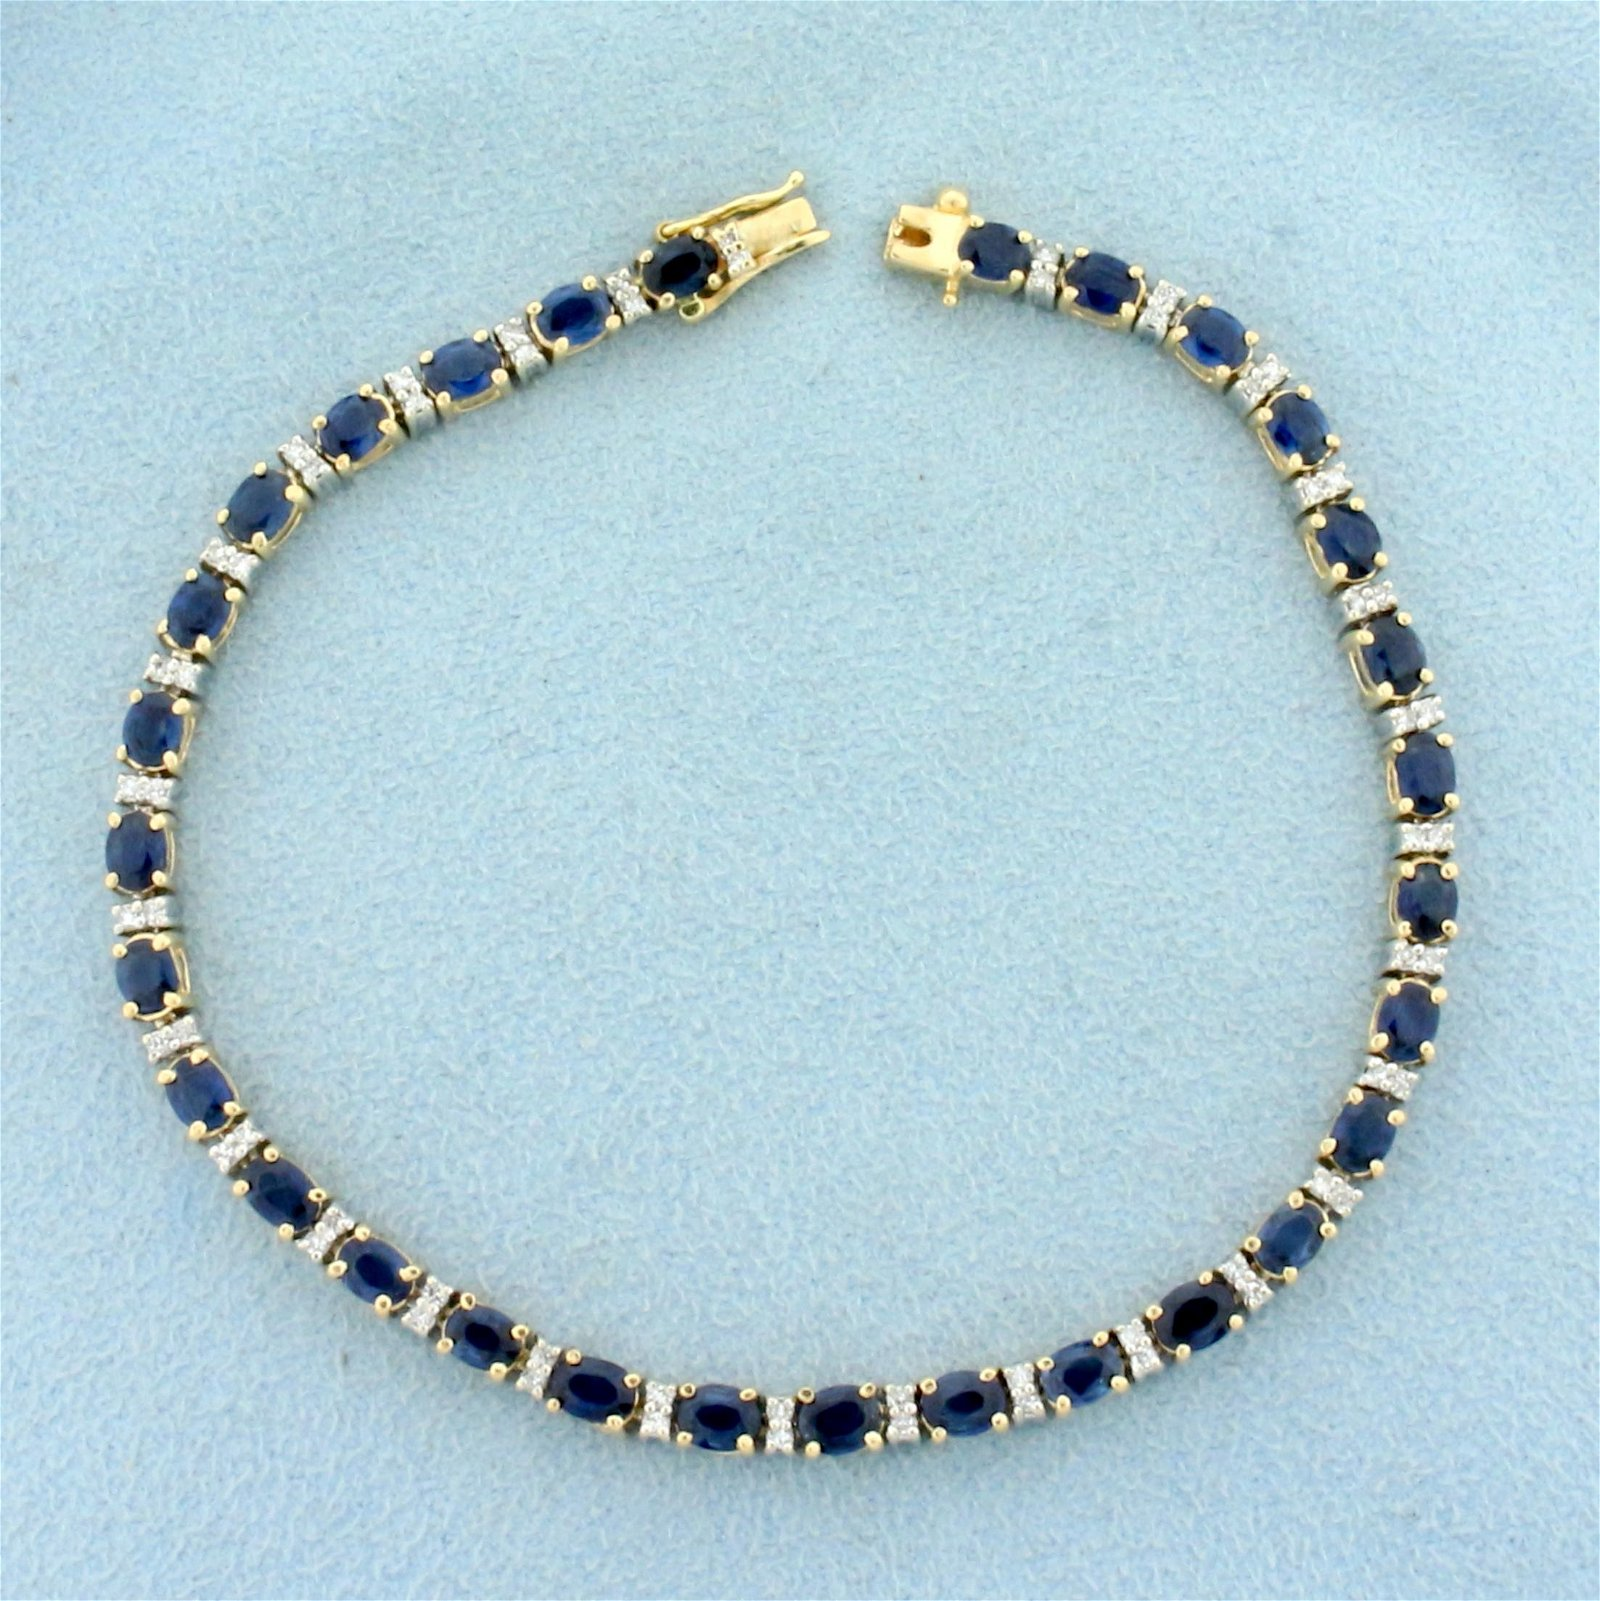 5ct TW Sapphire and Diamond Bracelet in 14K Yellow Gold